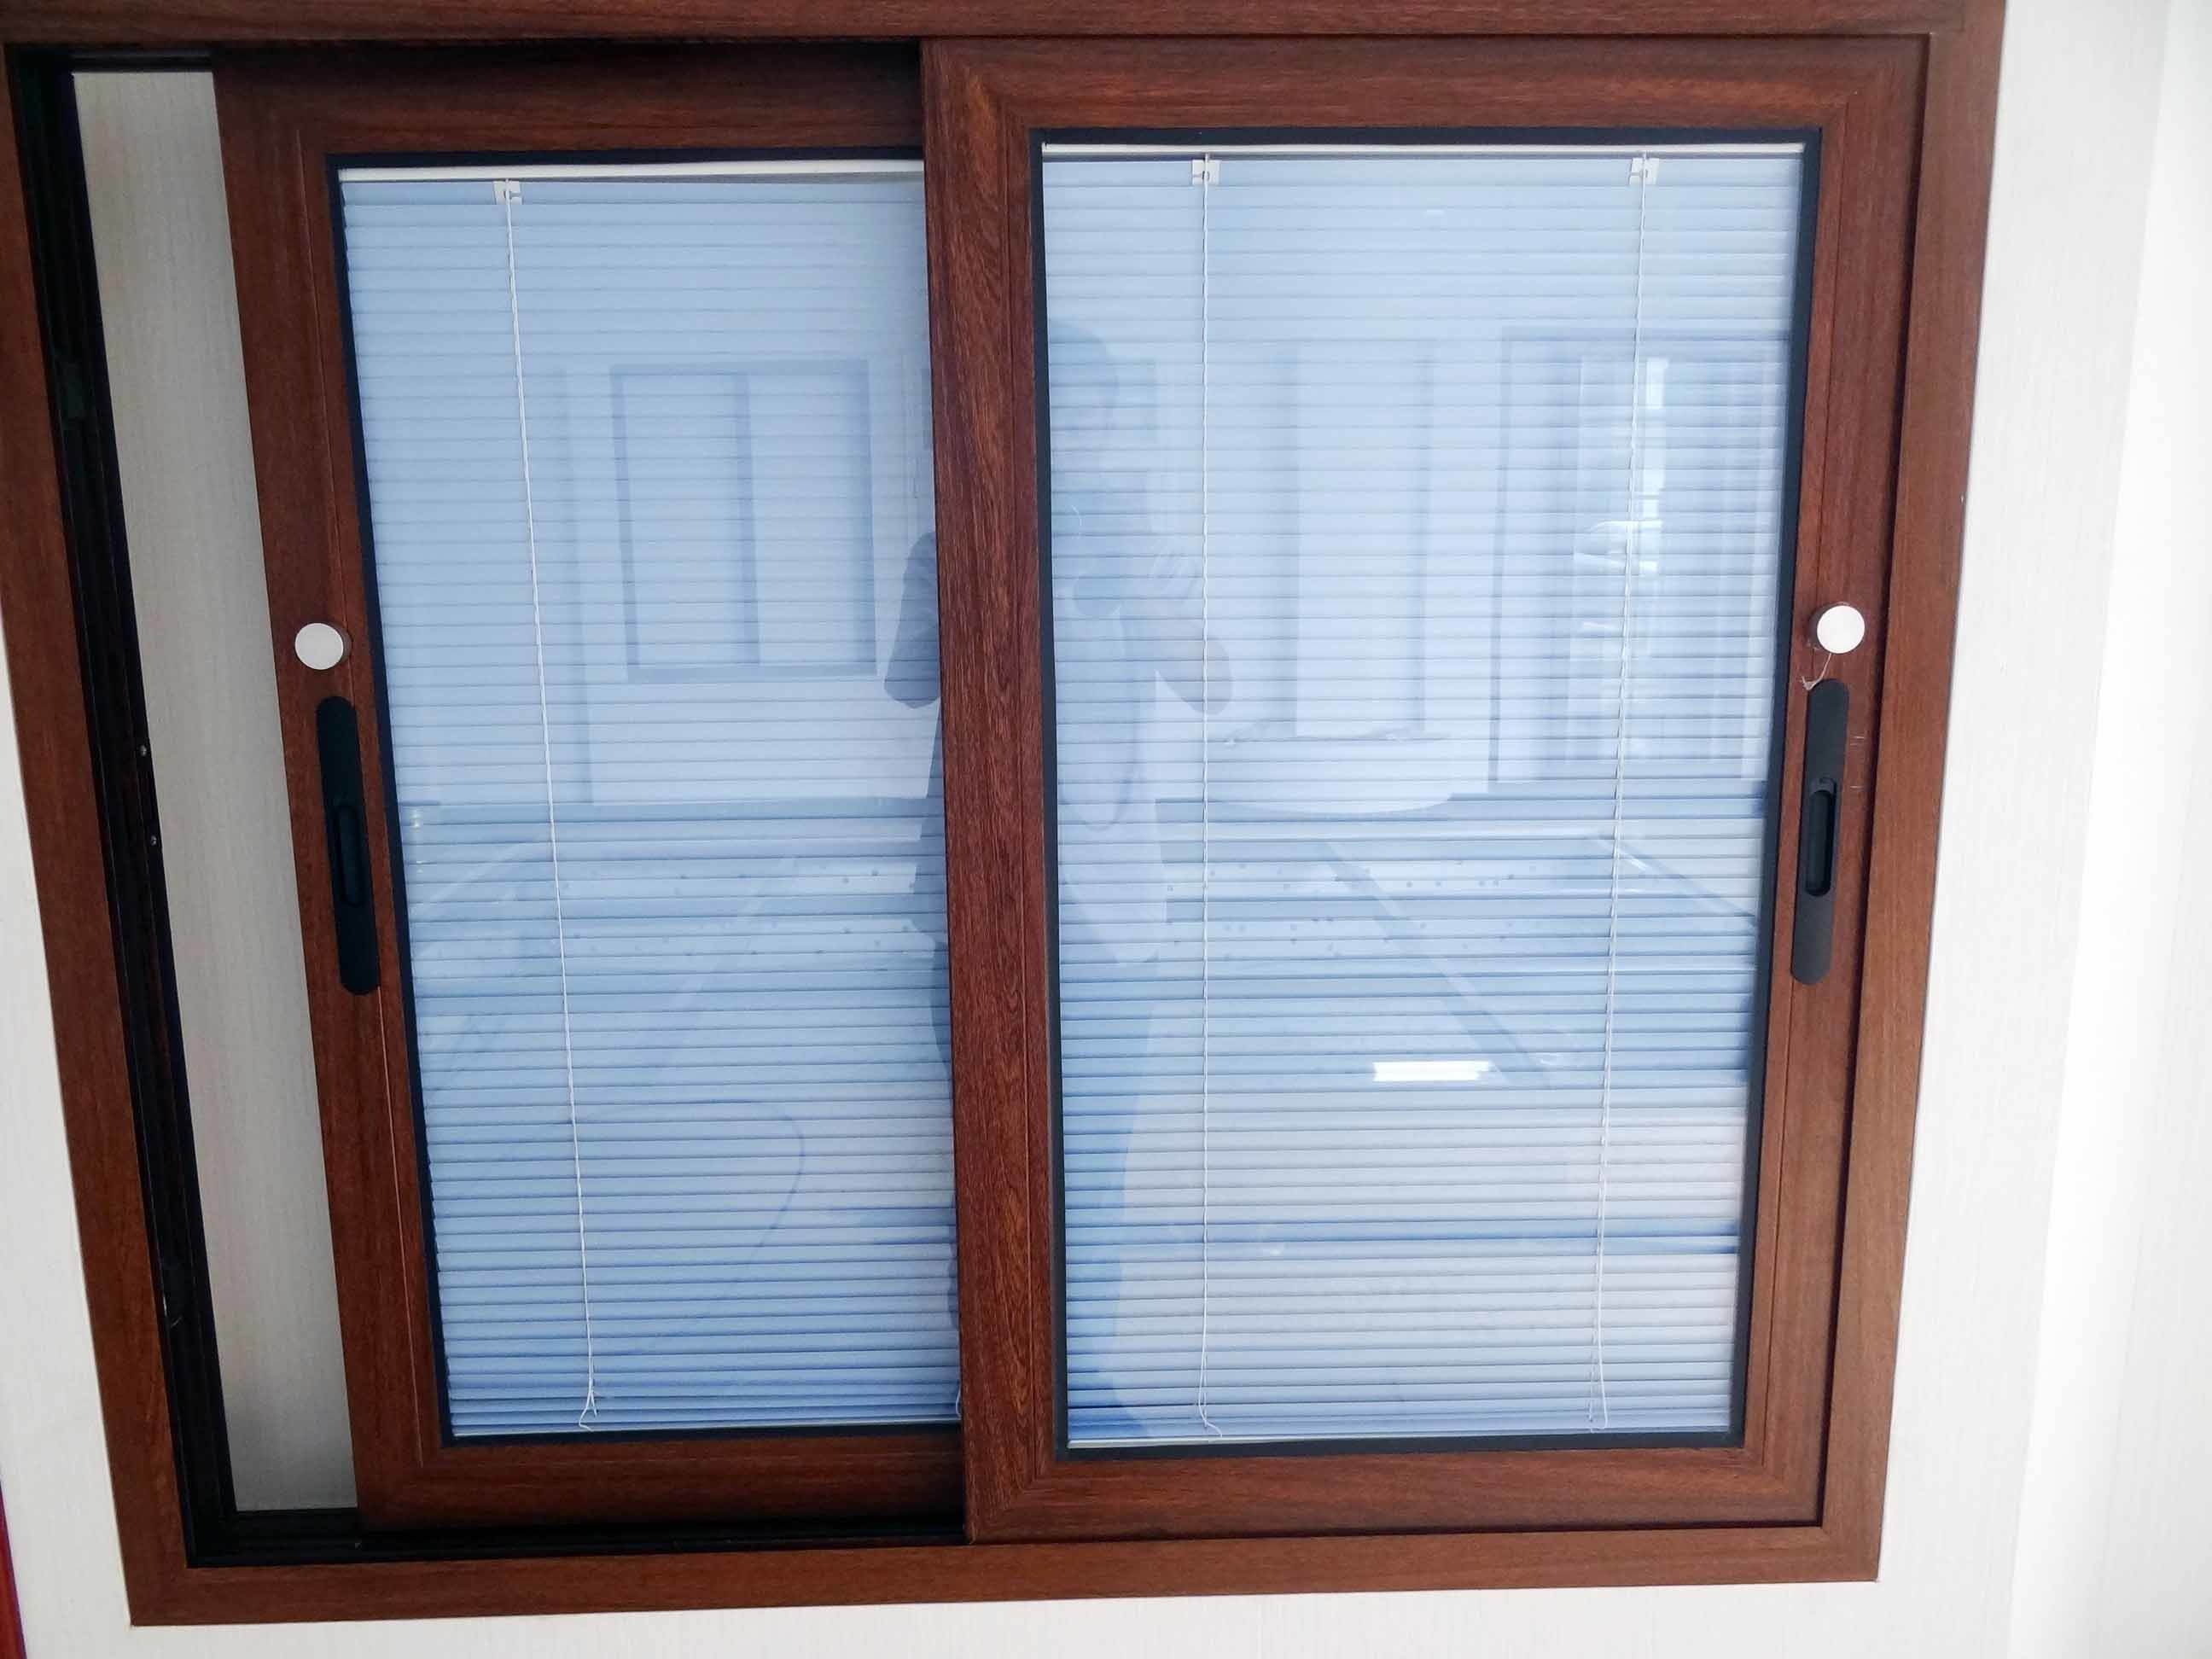 China good quality aluminium sliding window t g a s w 001 for Aluminium window design